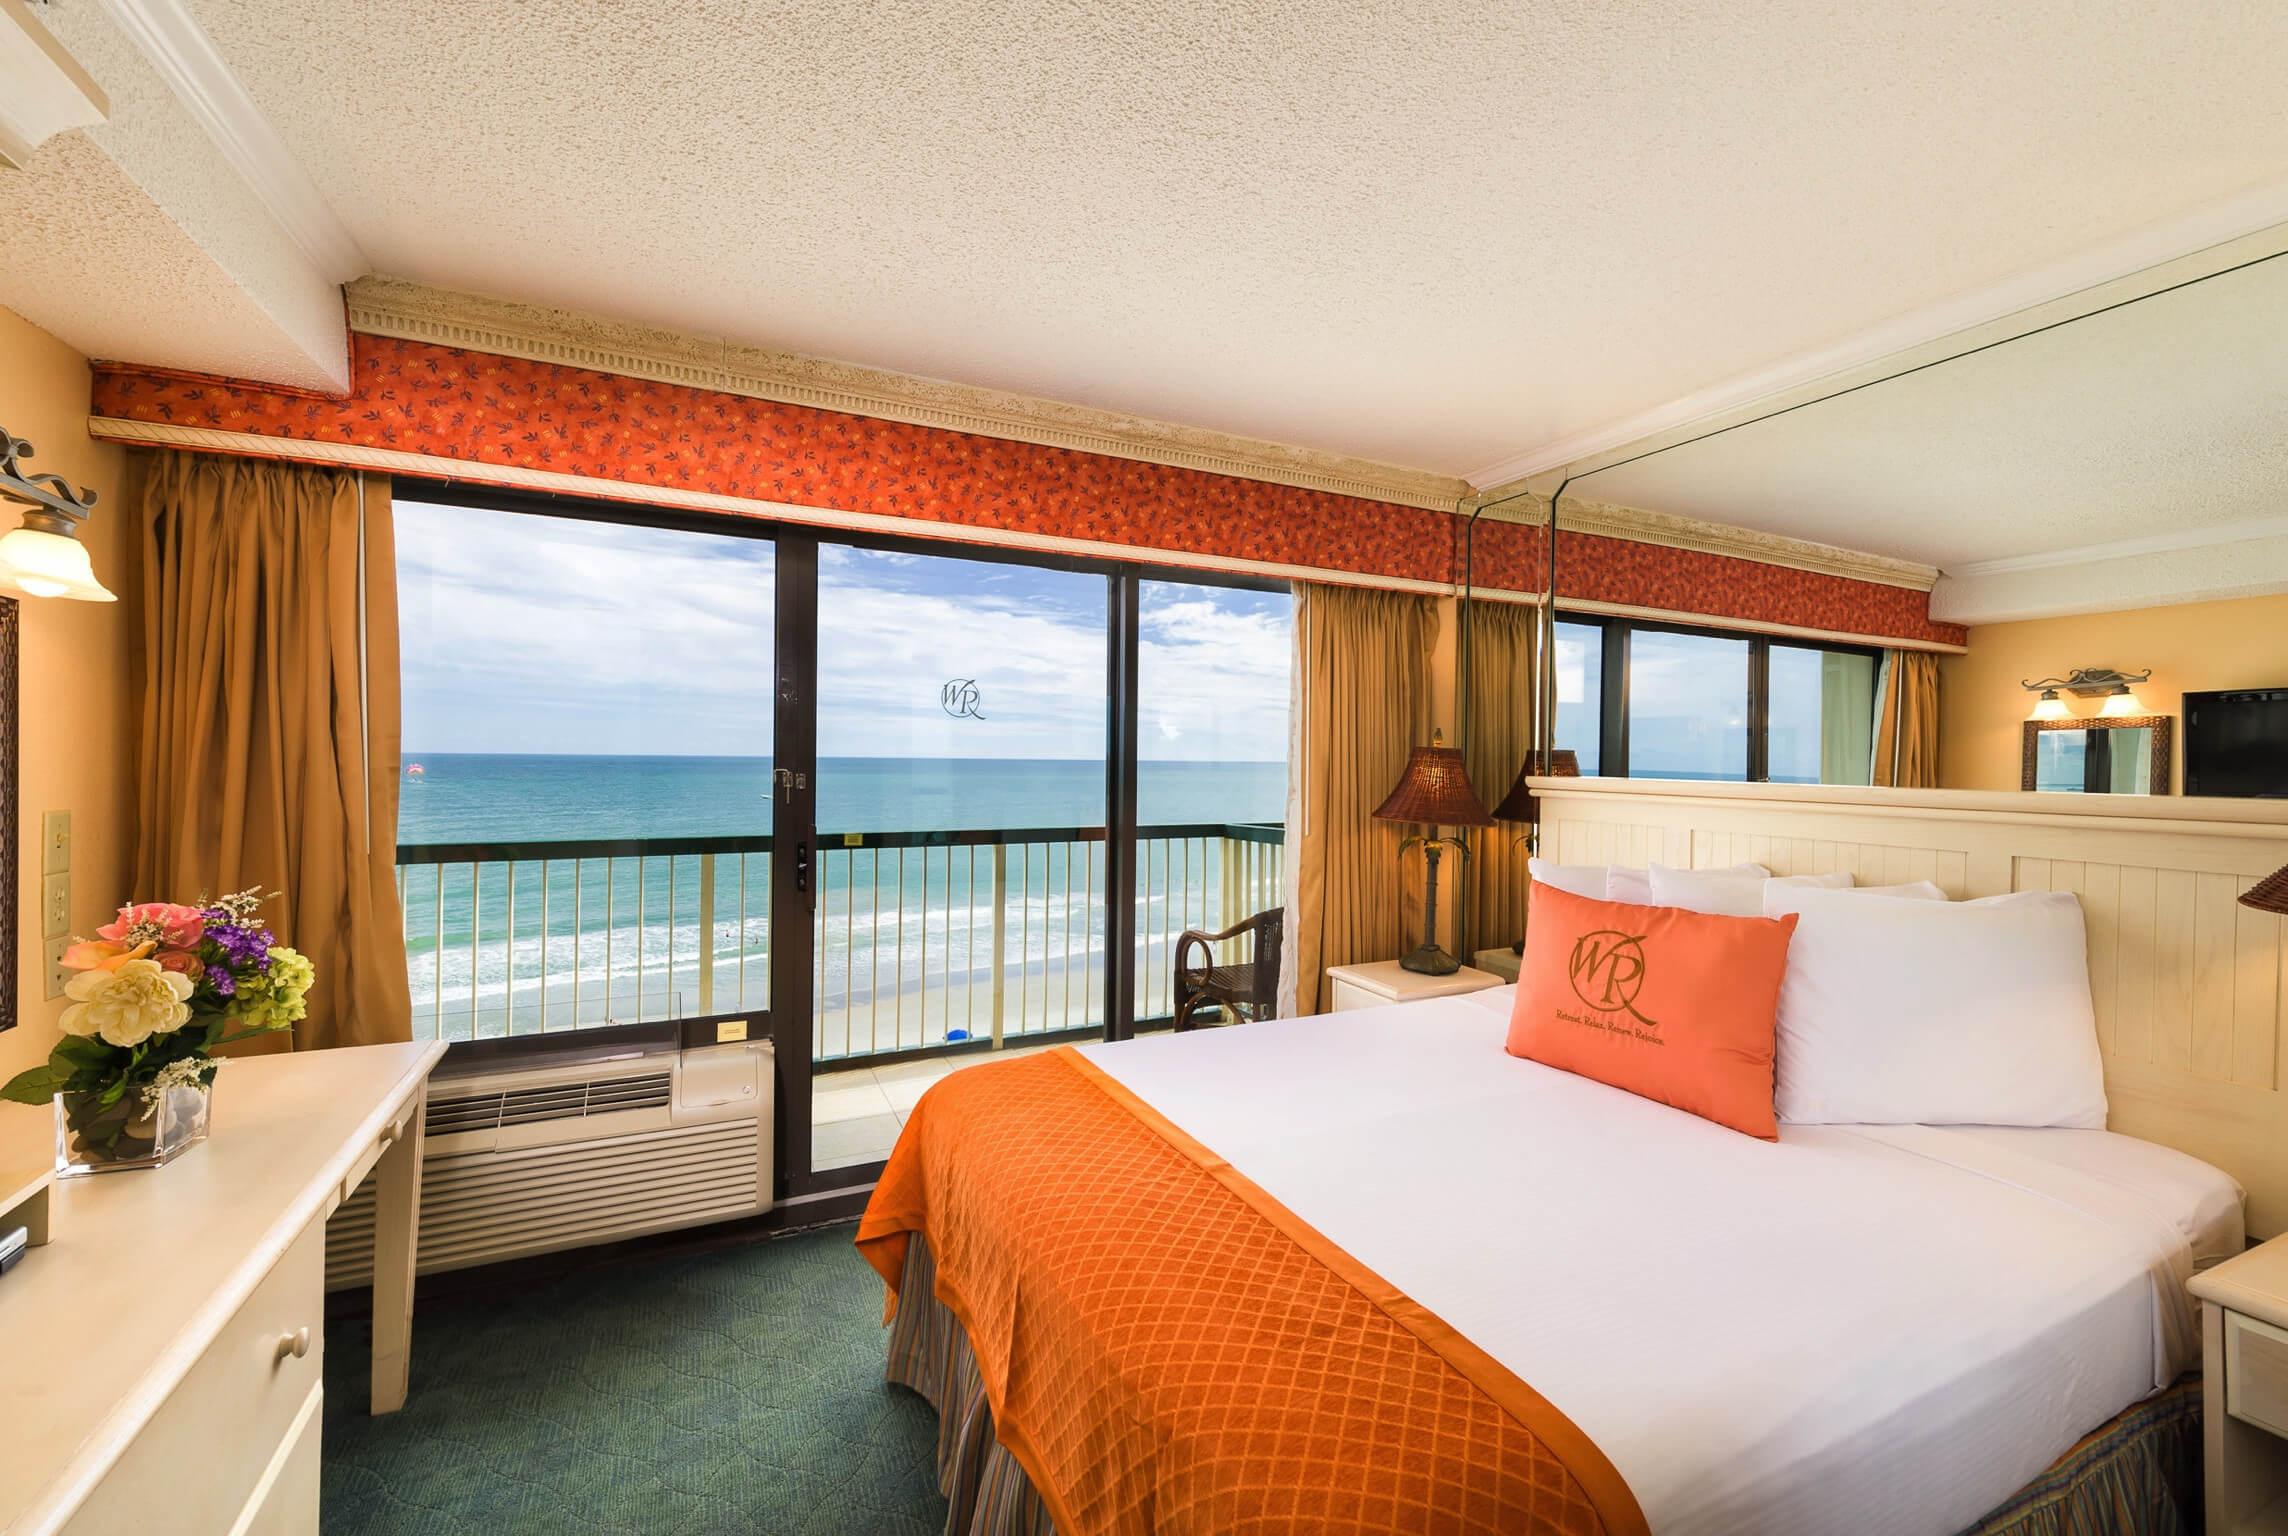 One Bedroom Ocean View Villa Westgate Myrtle Beach Oceanfront Resort Westgate Resorts And